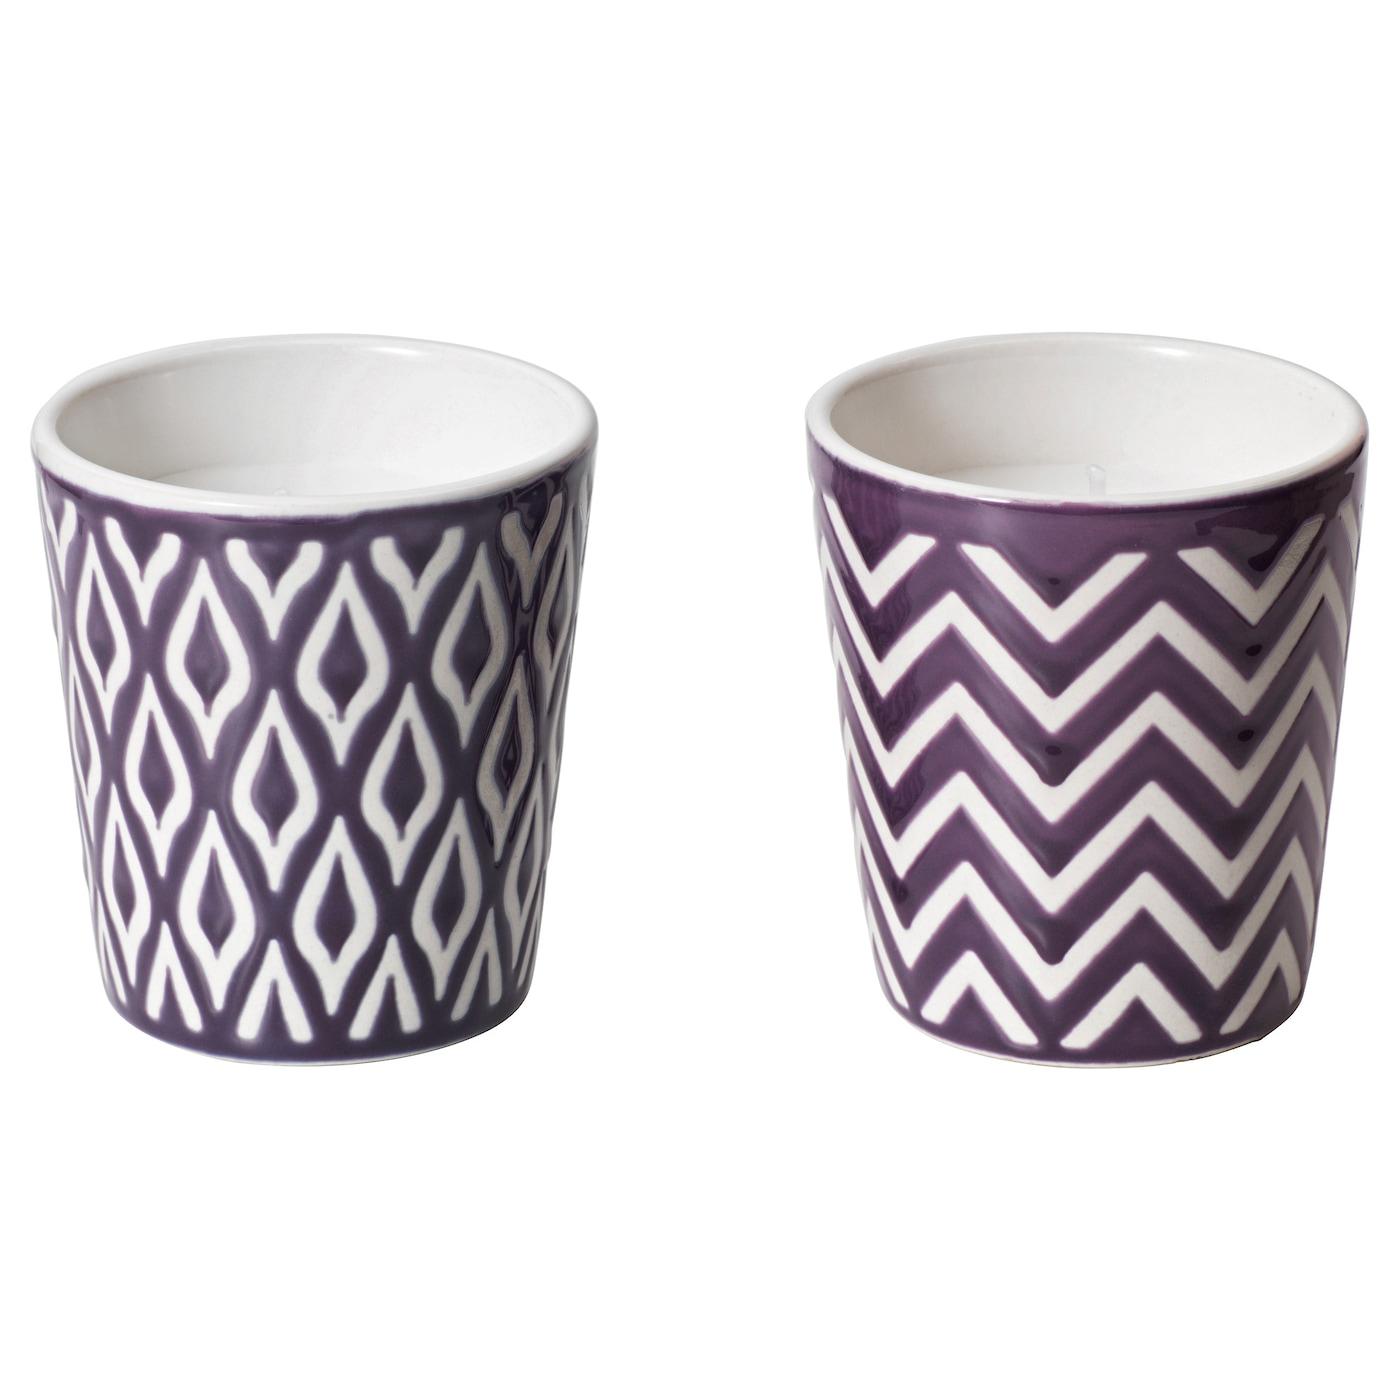 spralla scented candle in pot aloe vera lilac ikea. Black Bedroom Furniture Sets. Home Design Ideas